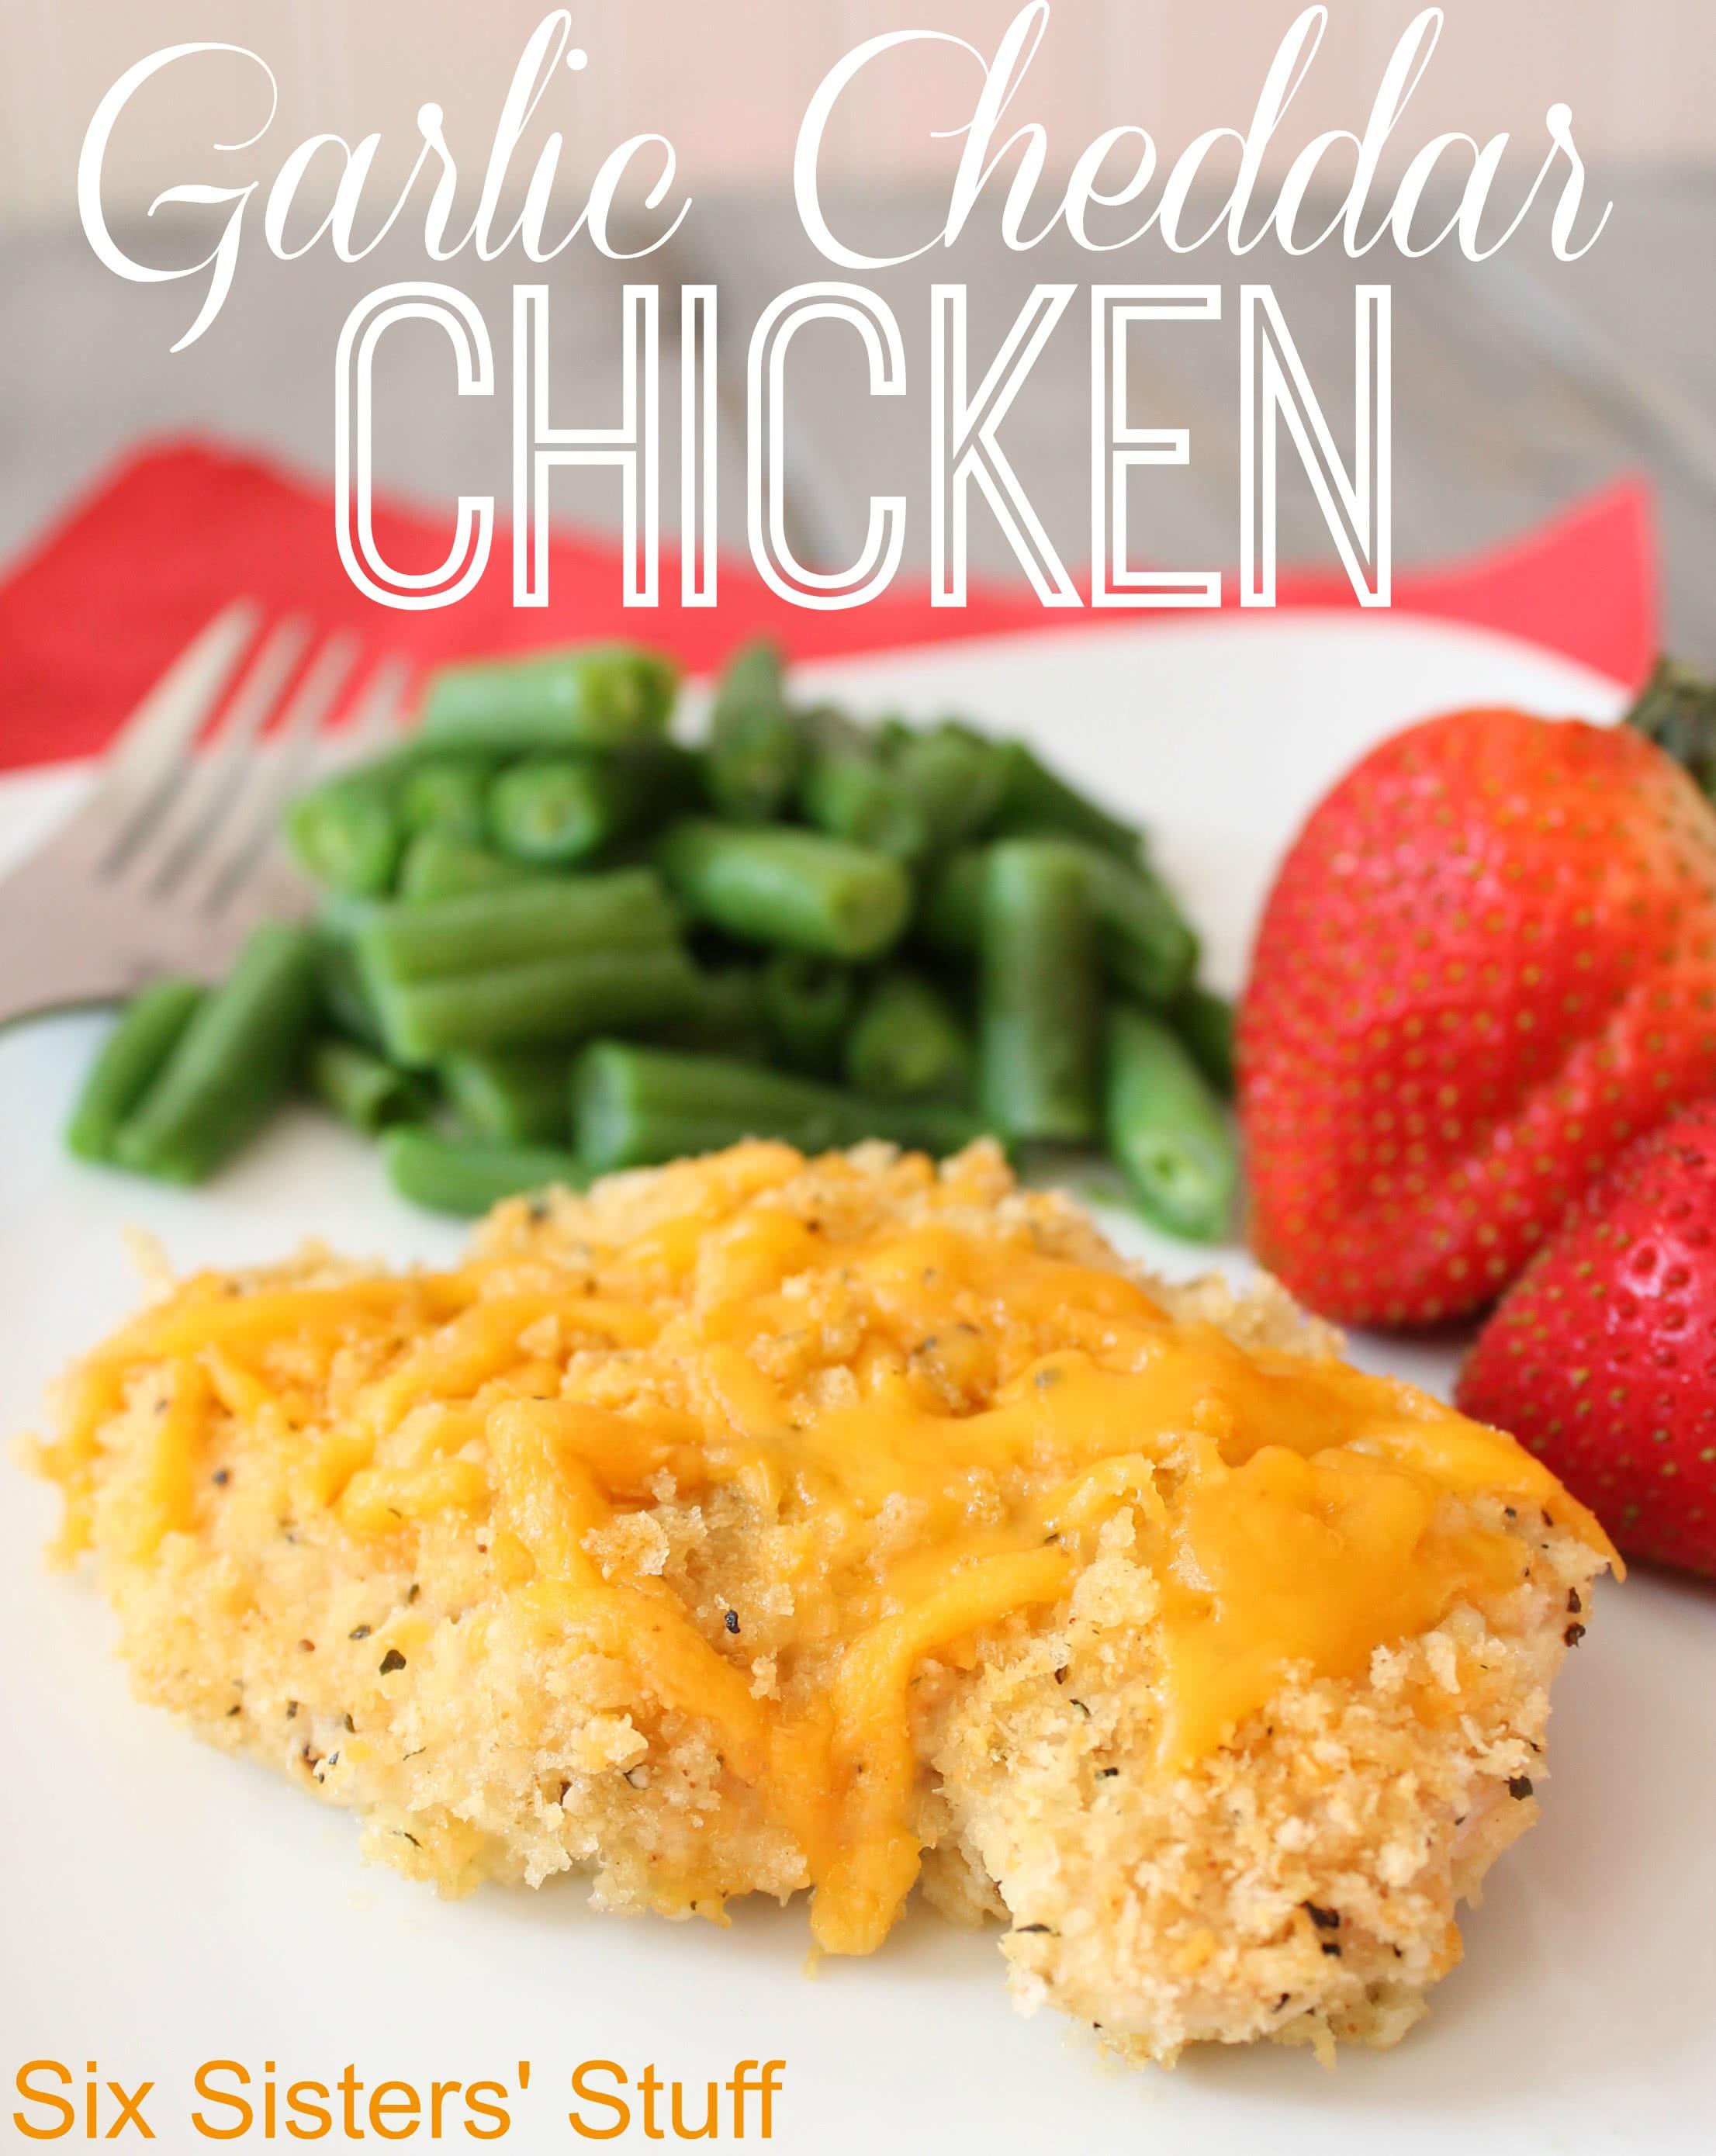 Garlic Cheddar Chicken Recipe